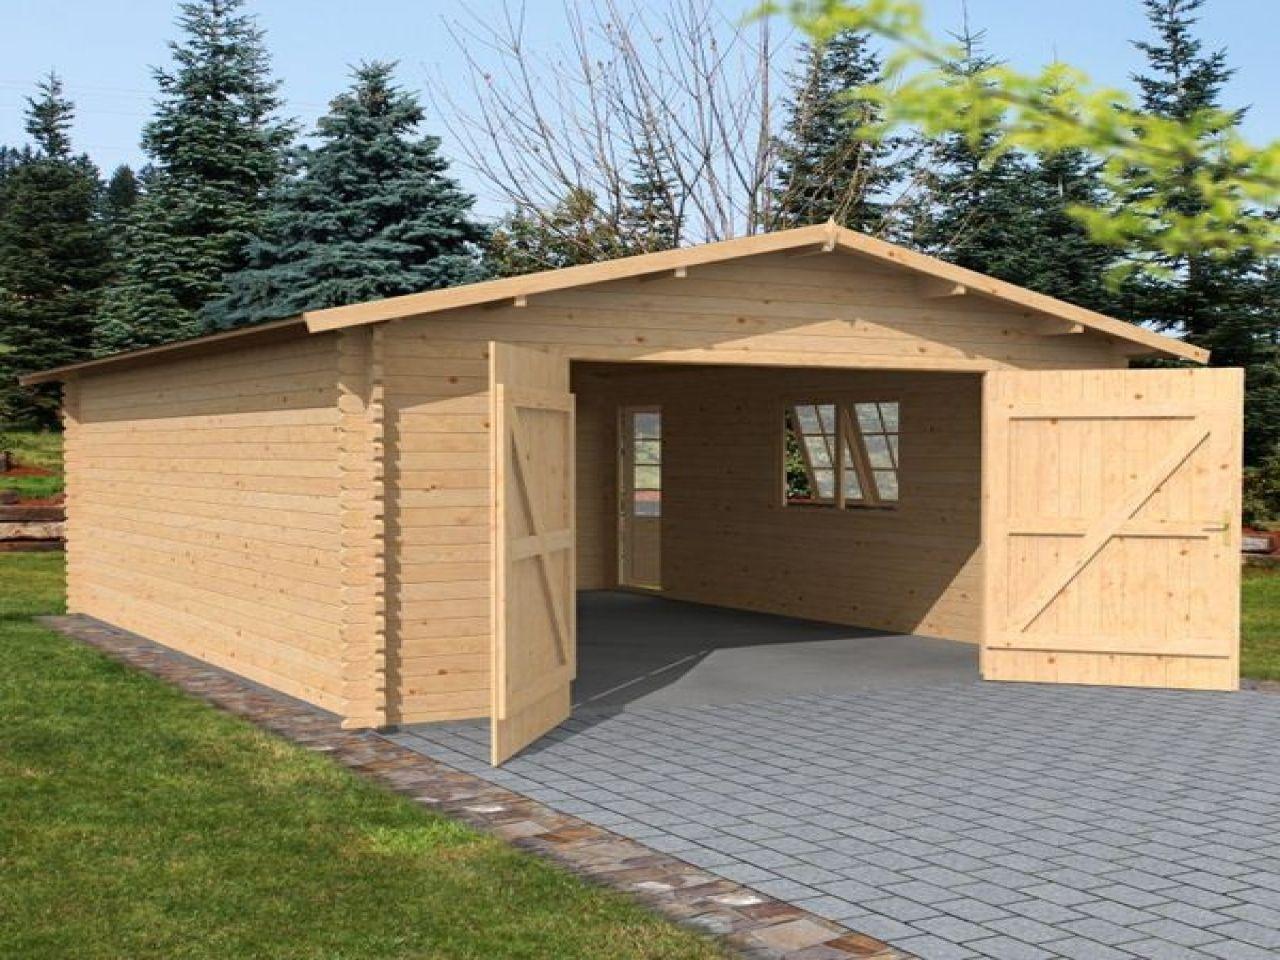 Pin by Pineca Com on Wooden garages | Diy carport, Carport ...